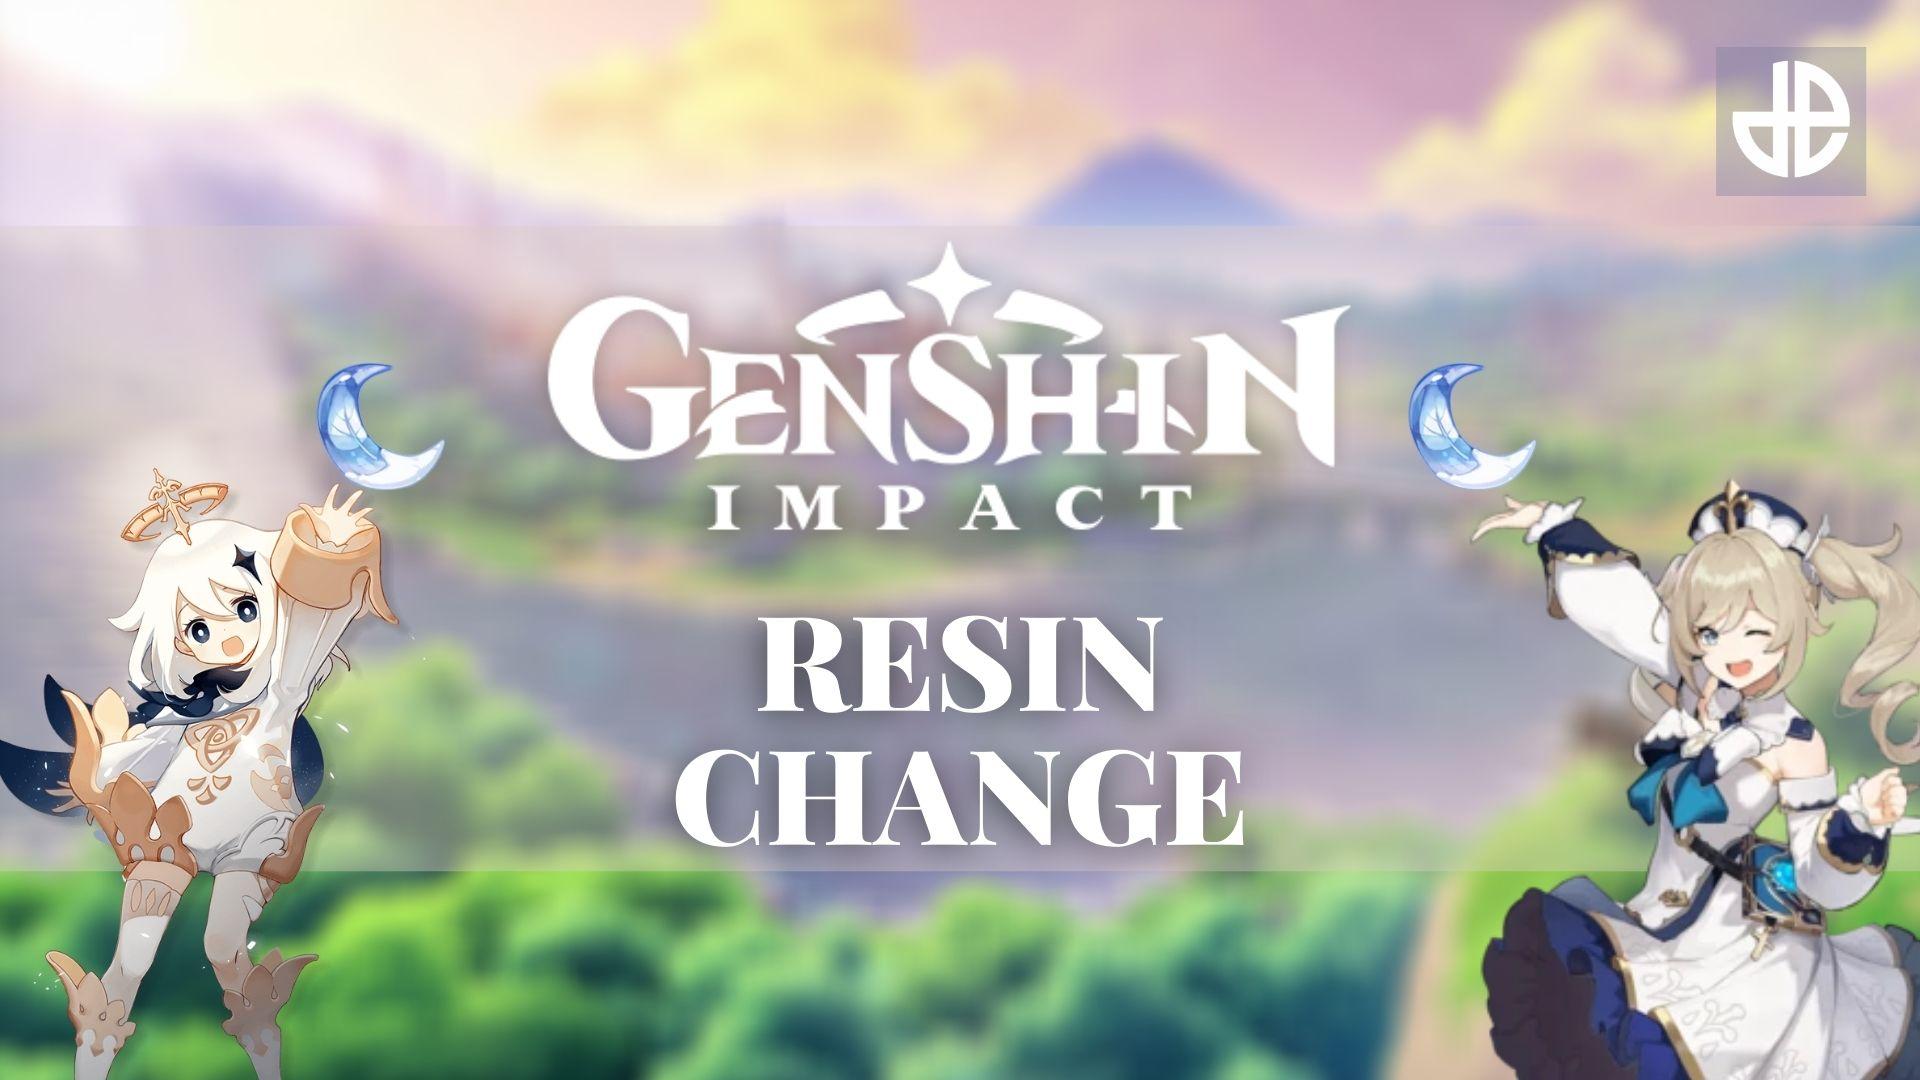 Genshin Impact Resin system